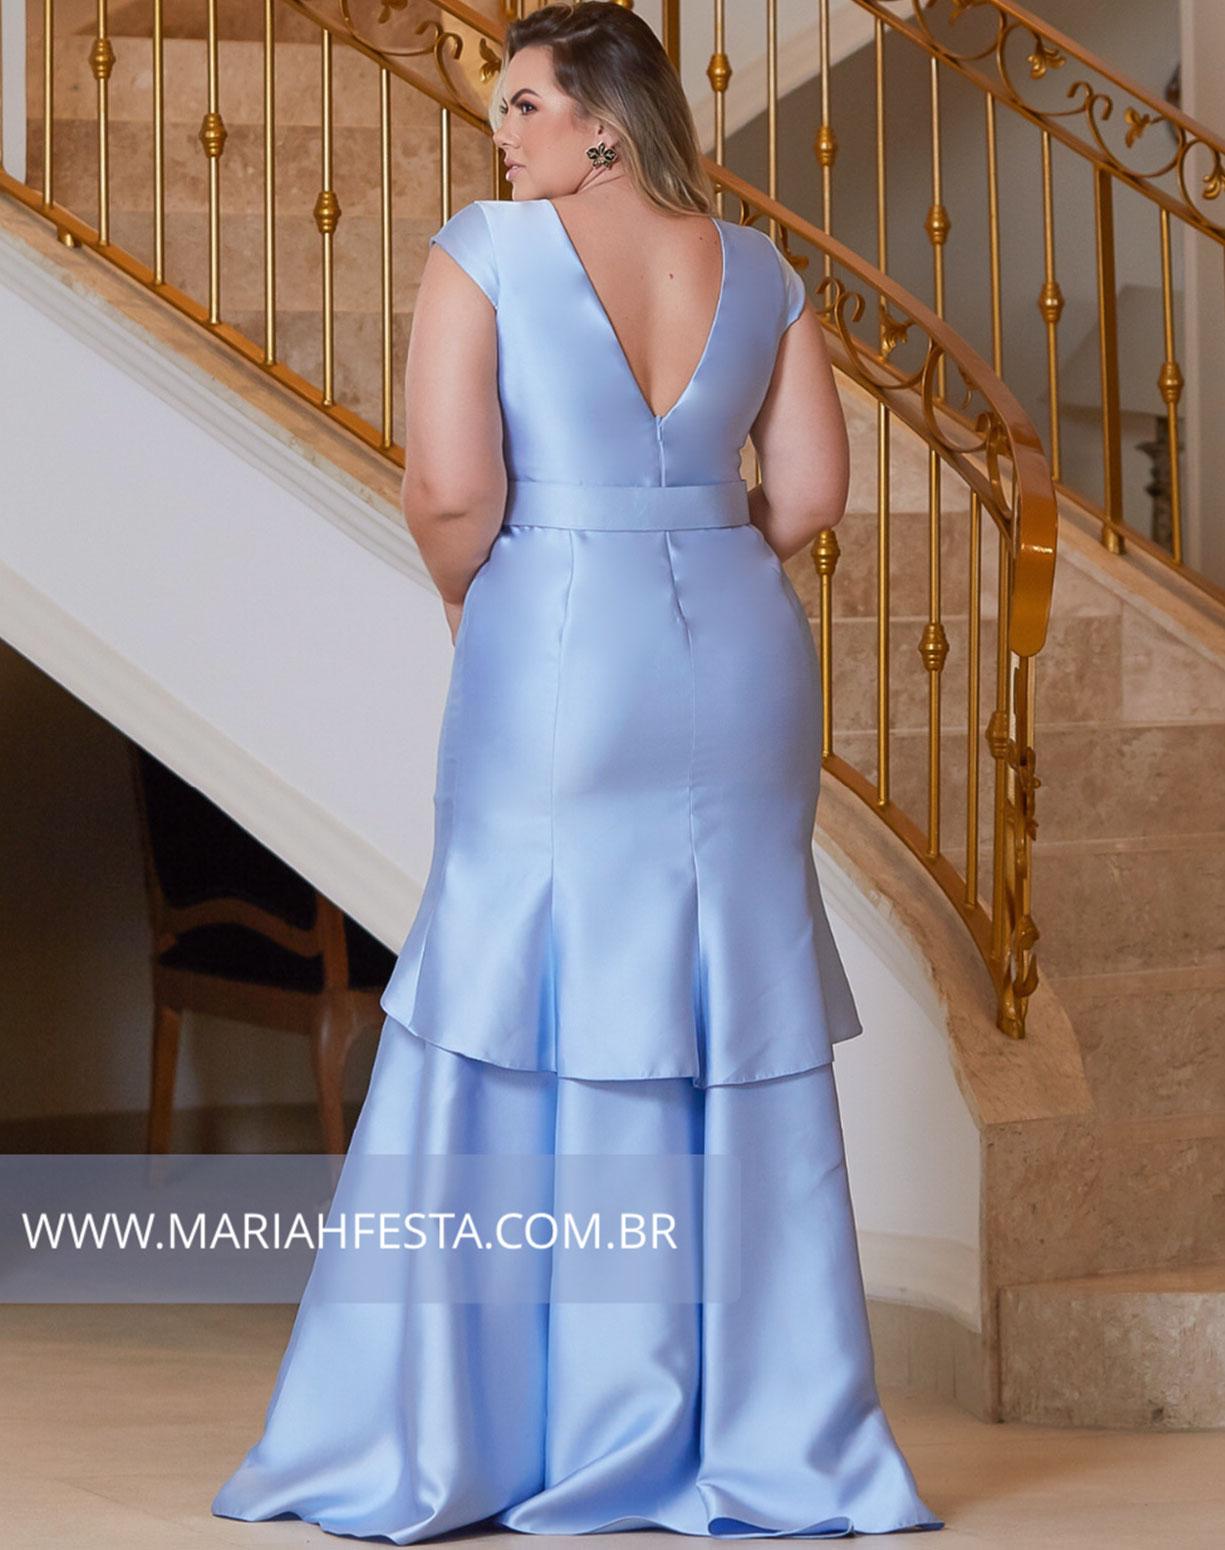 Vestido Azul Serenity Sereia em Zibeline